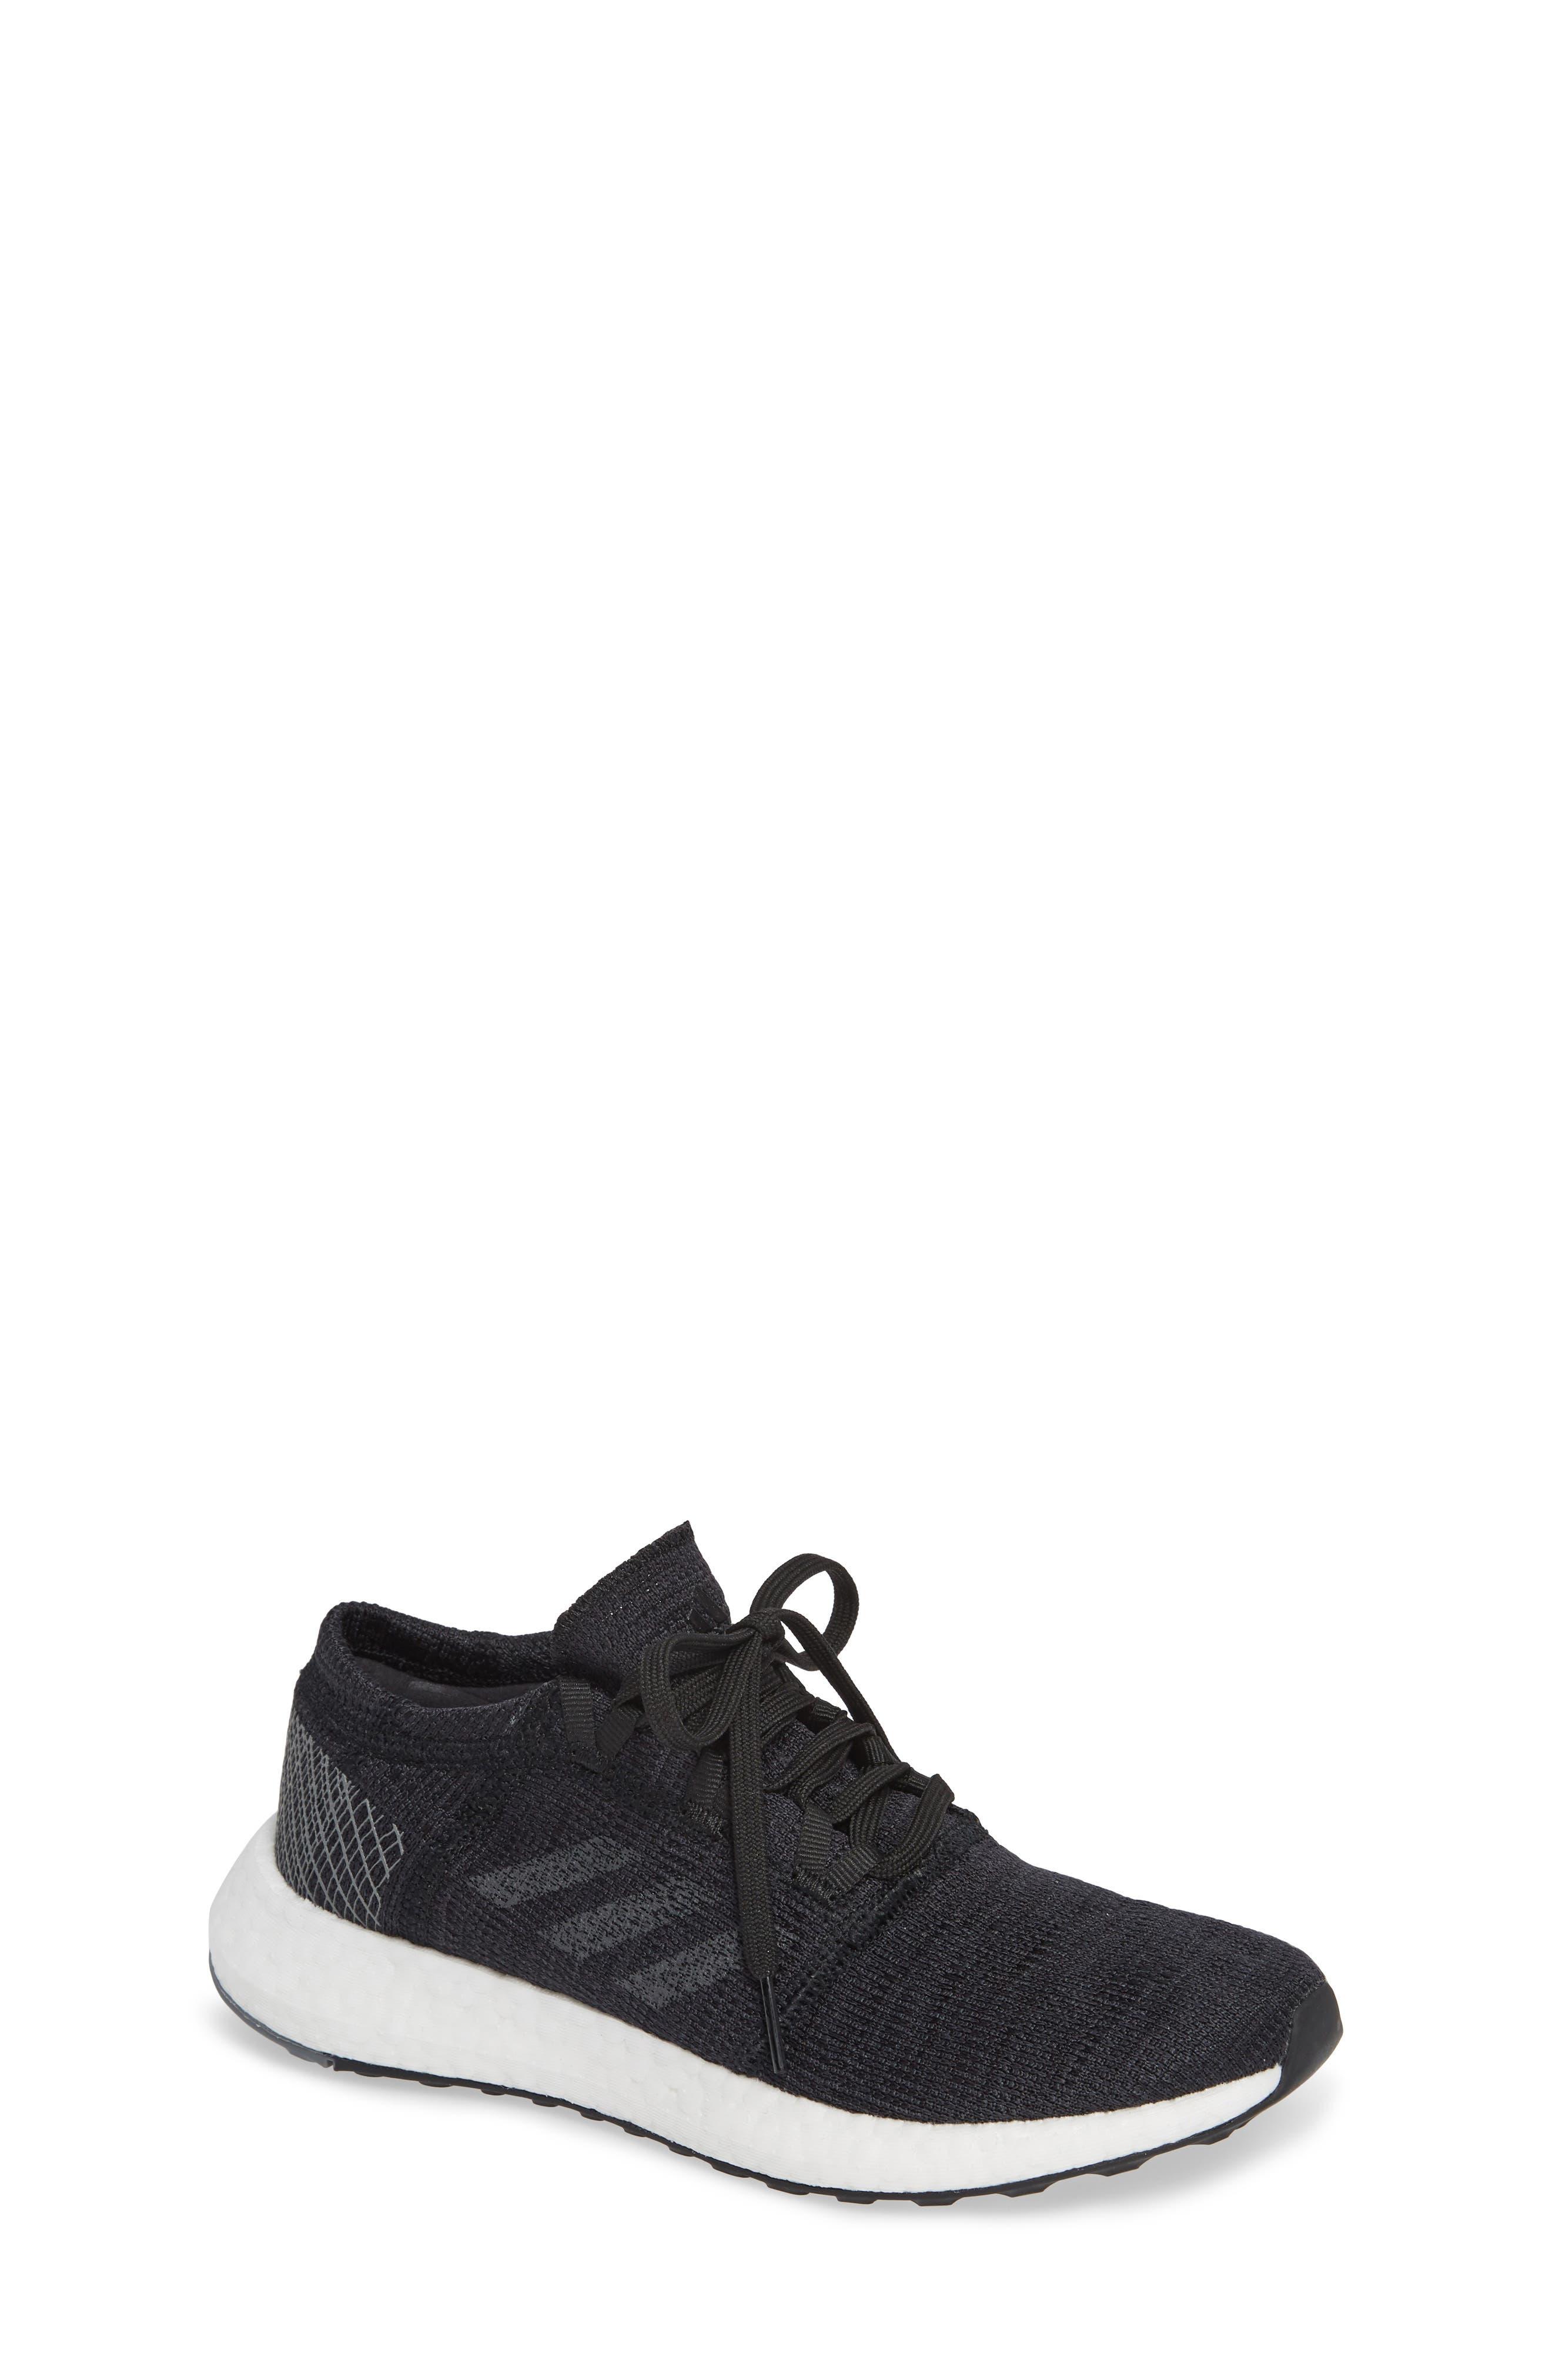 ADIDAS PureBoost GO Running Shoe, Main, color, 001